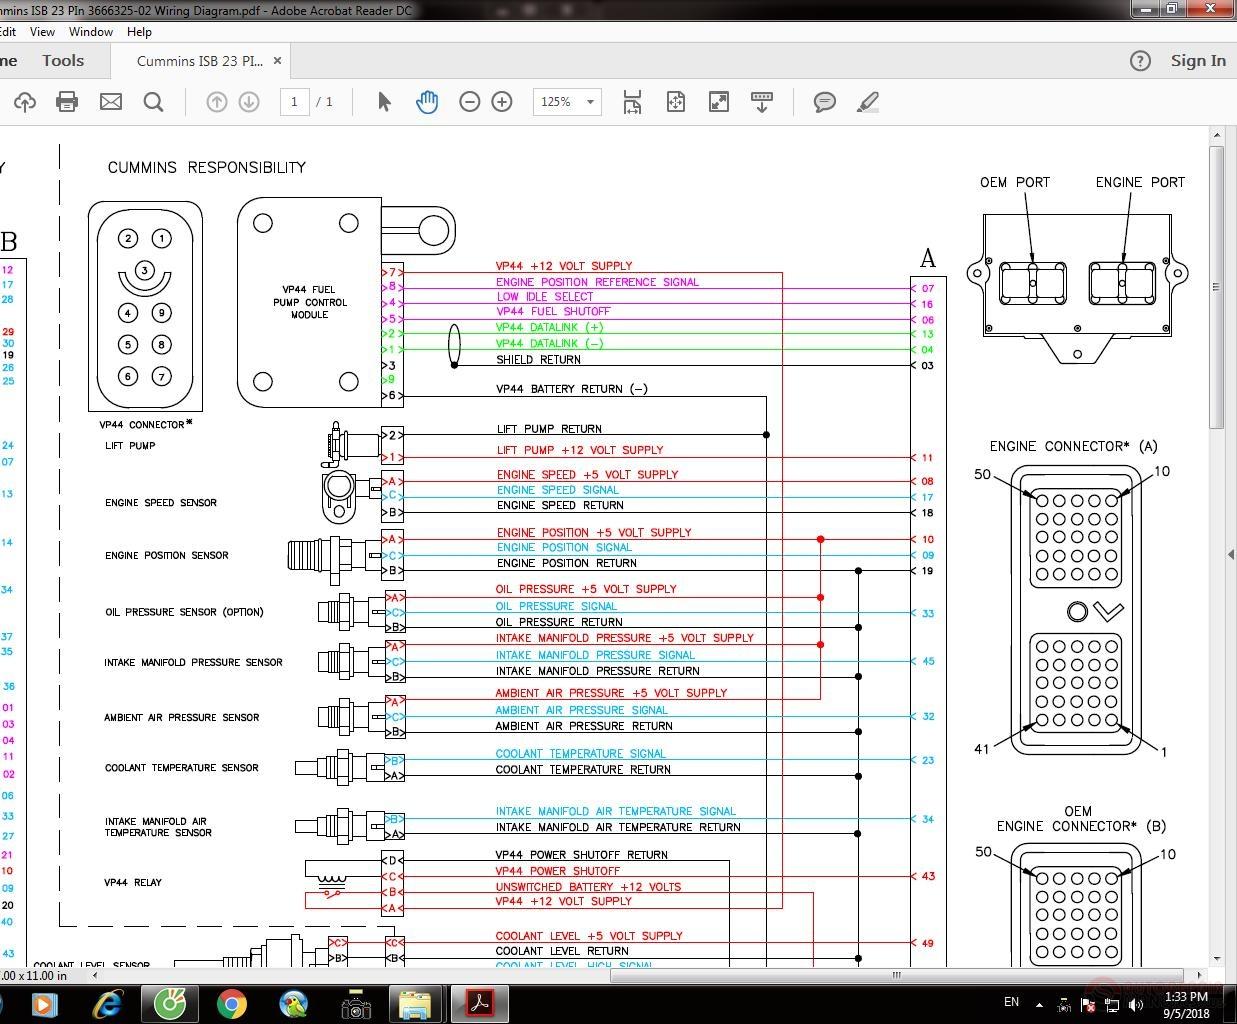 Cummins_ISB_23_PIn_3666325 02_Wiring_Diagram_3 isb 50 pin wiring diagram best wiring library